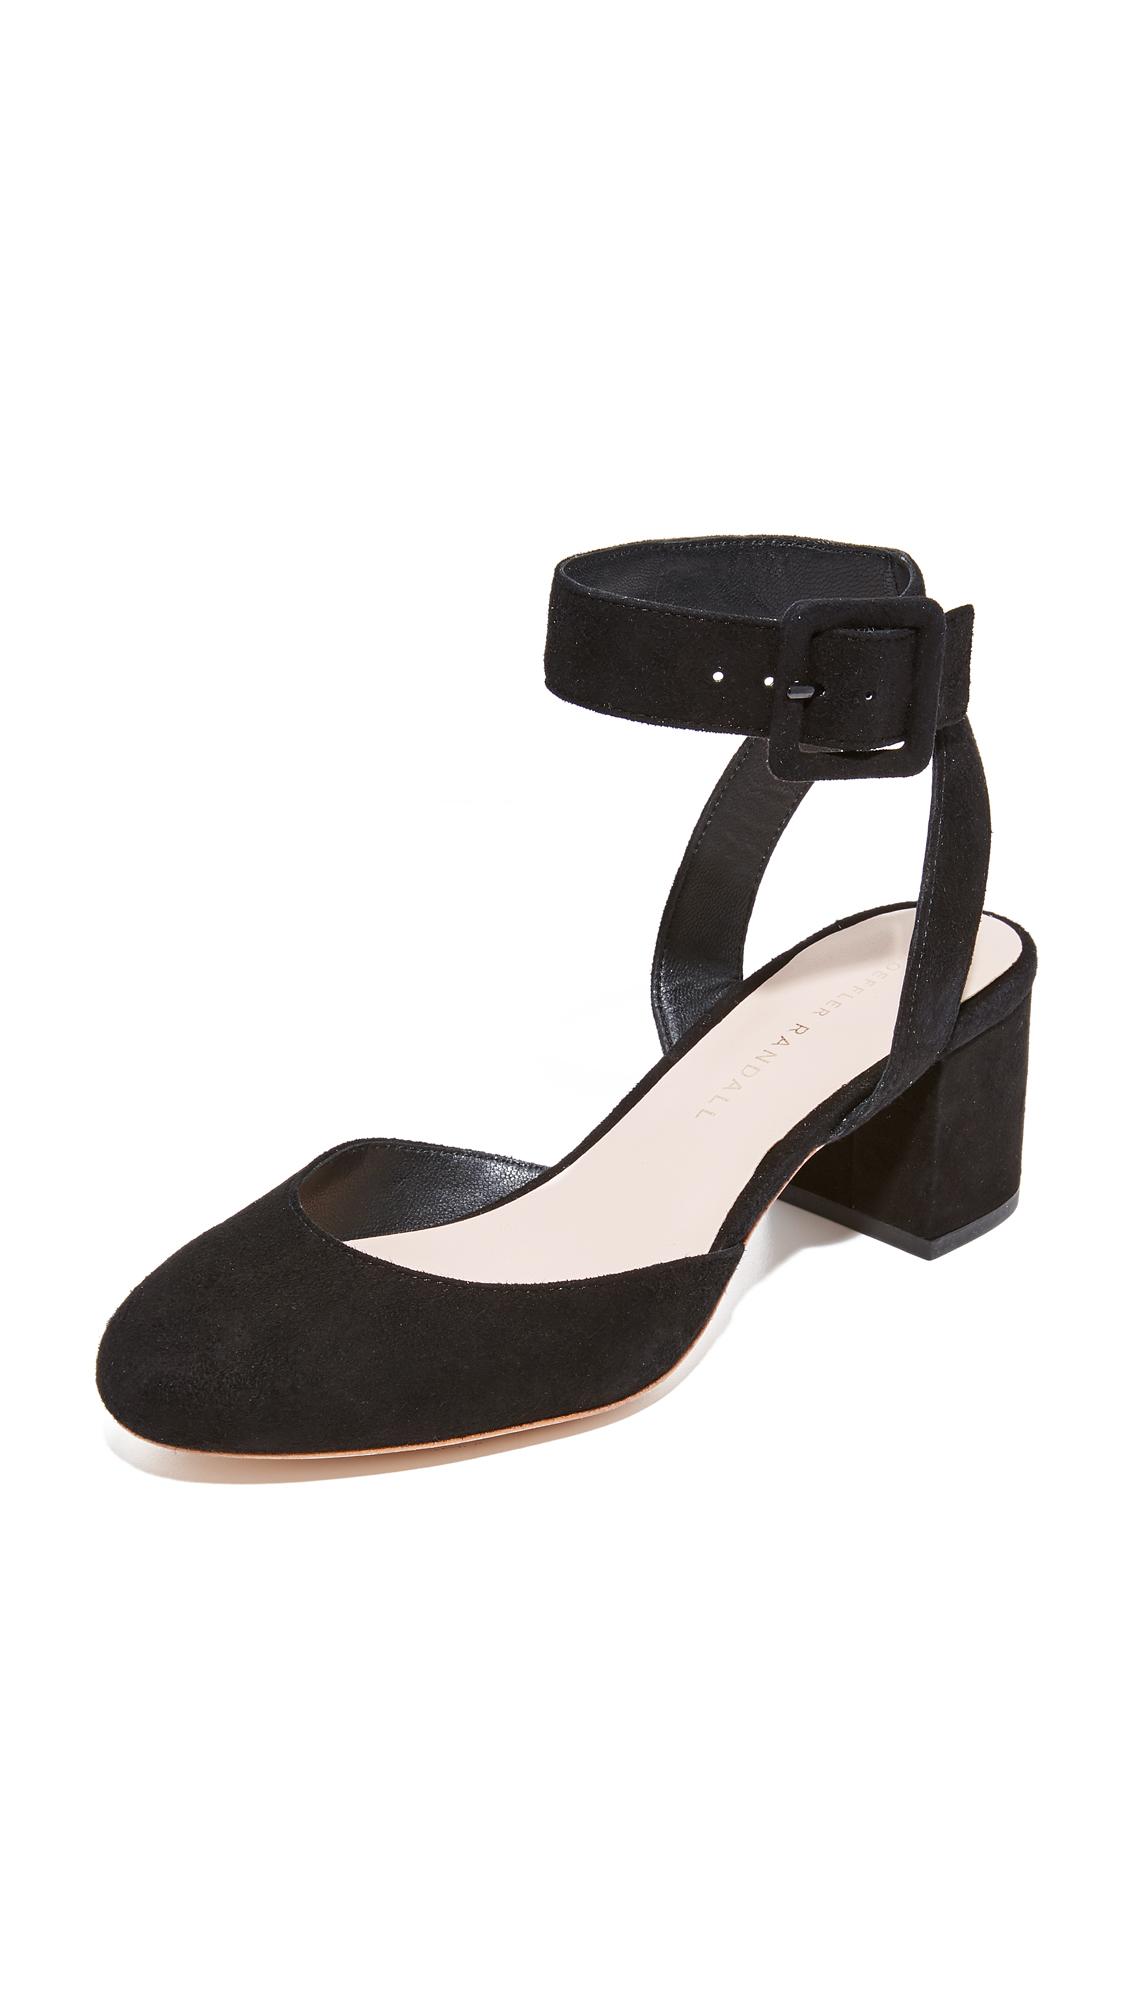 Loeffler Randall Cami Ankle Strap Pumps - Black